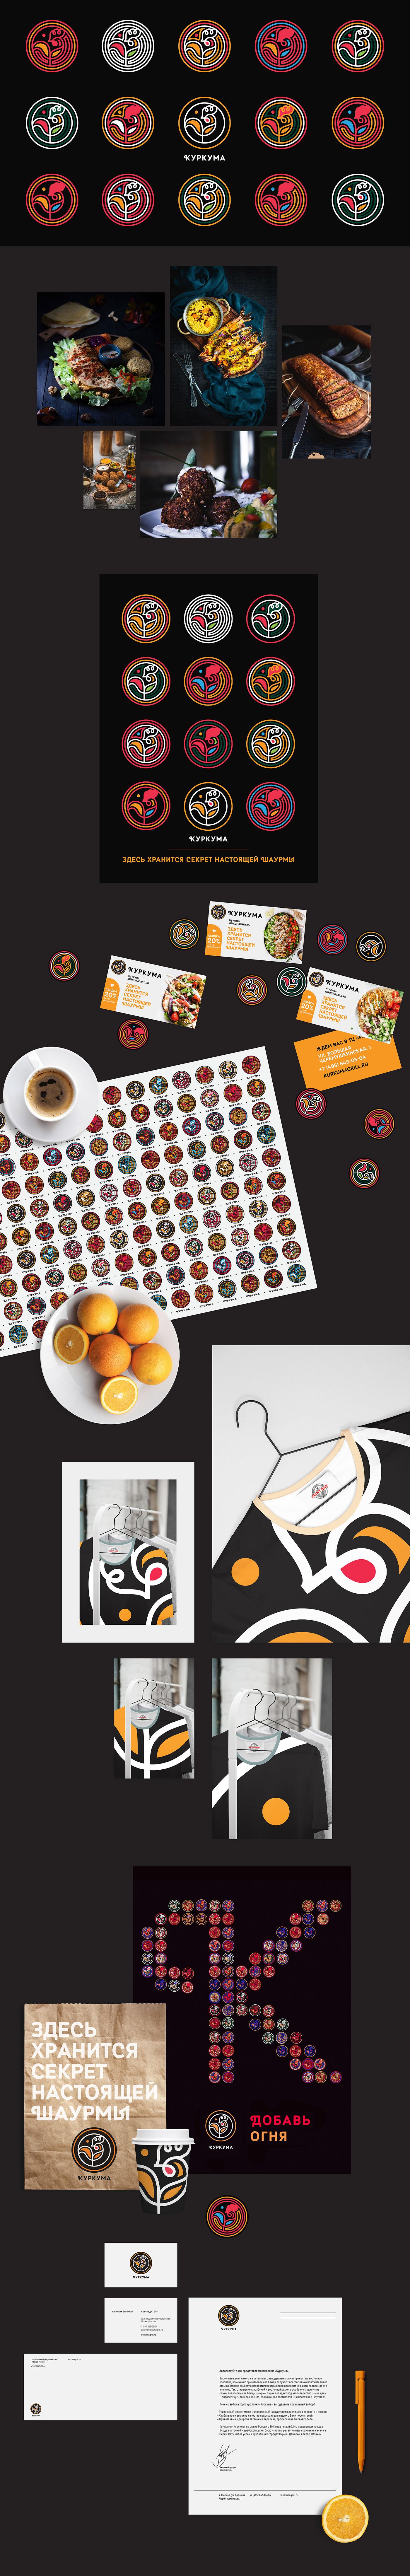 branding  brand identity identity graphic design  HORECA cafe restaurant shawarma Arabic cuisine